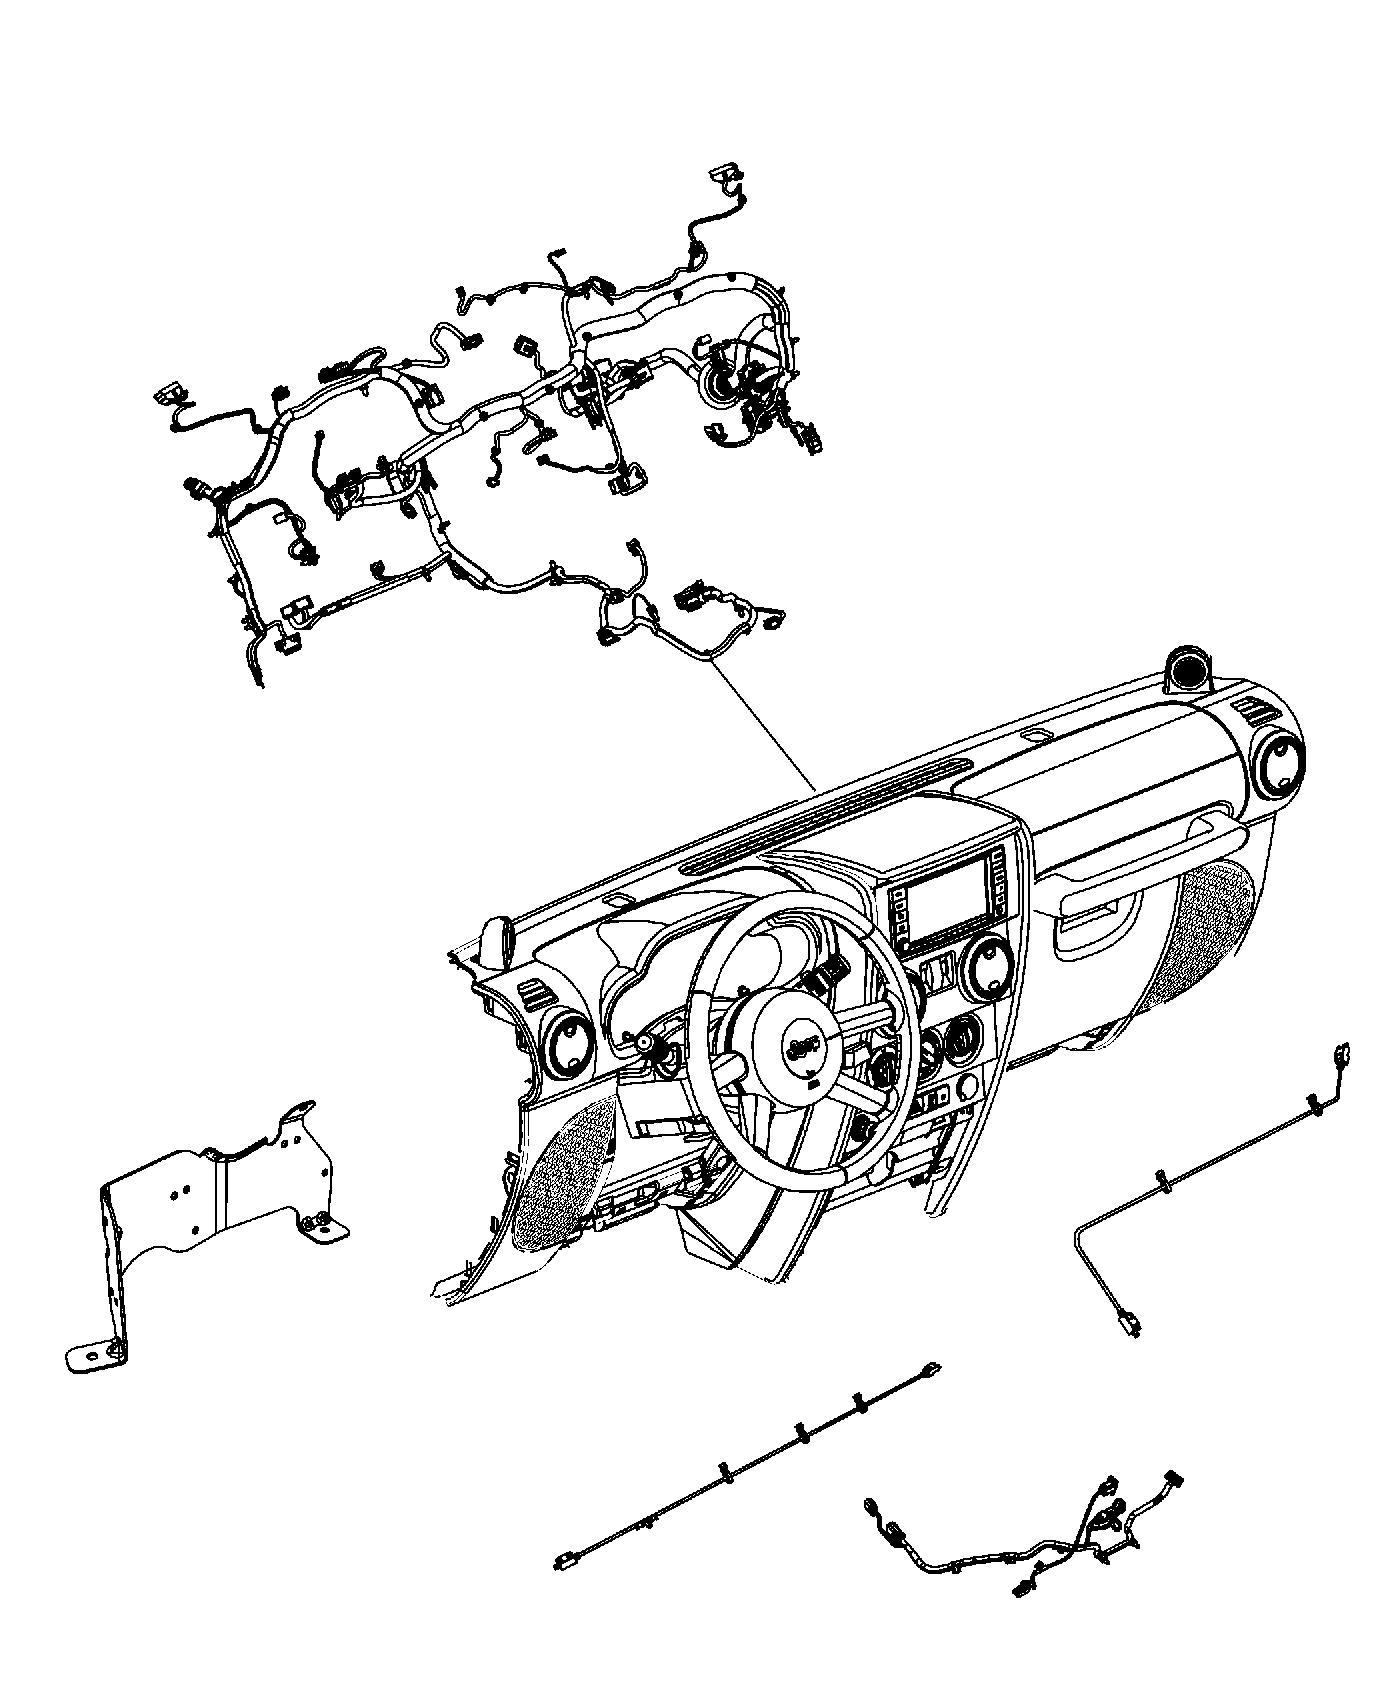 Jeep Wrangler Wiring Console Trim All Trim Codes